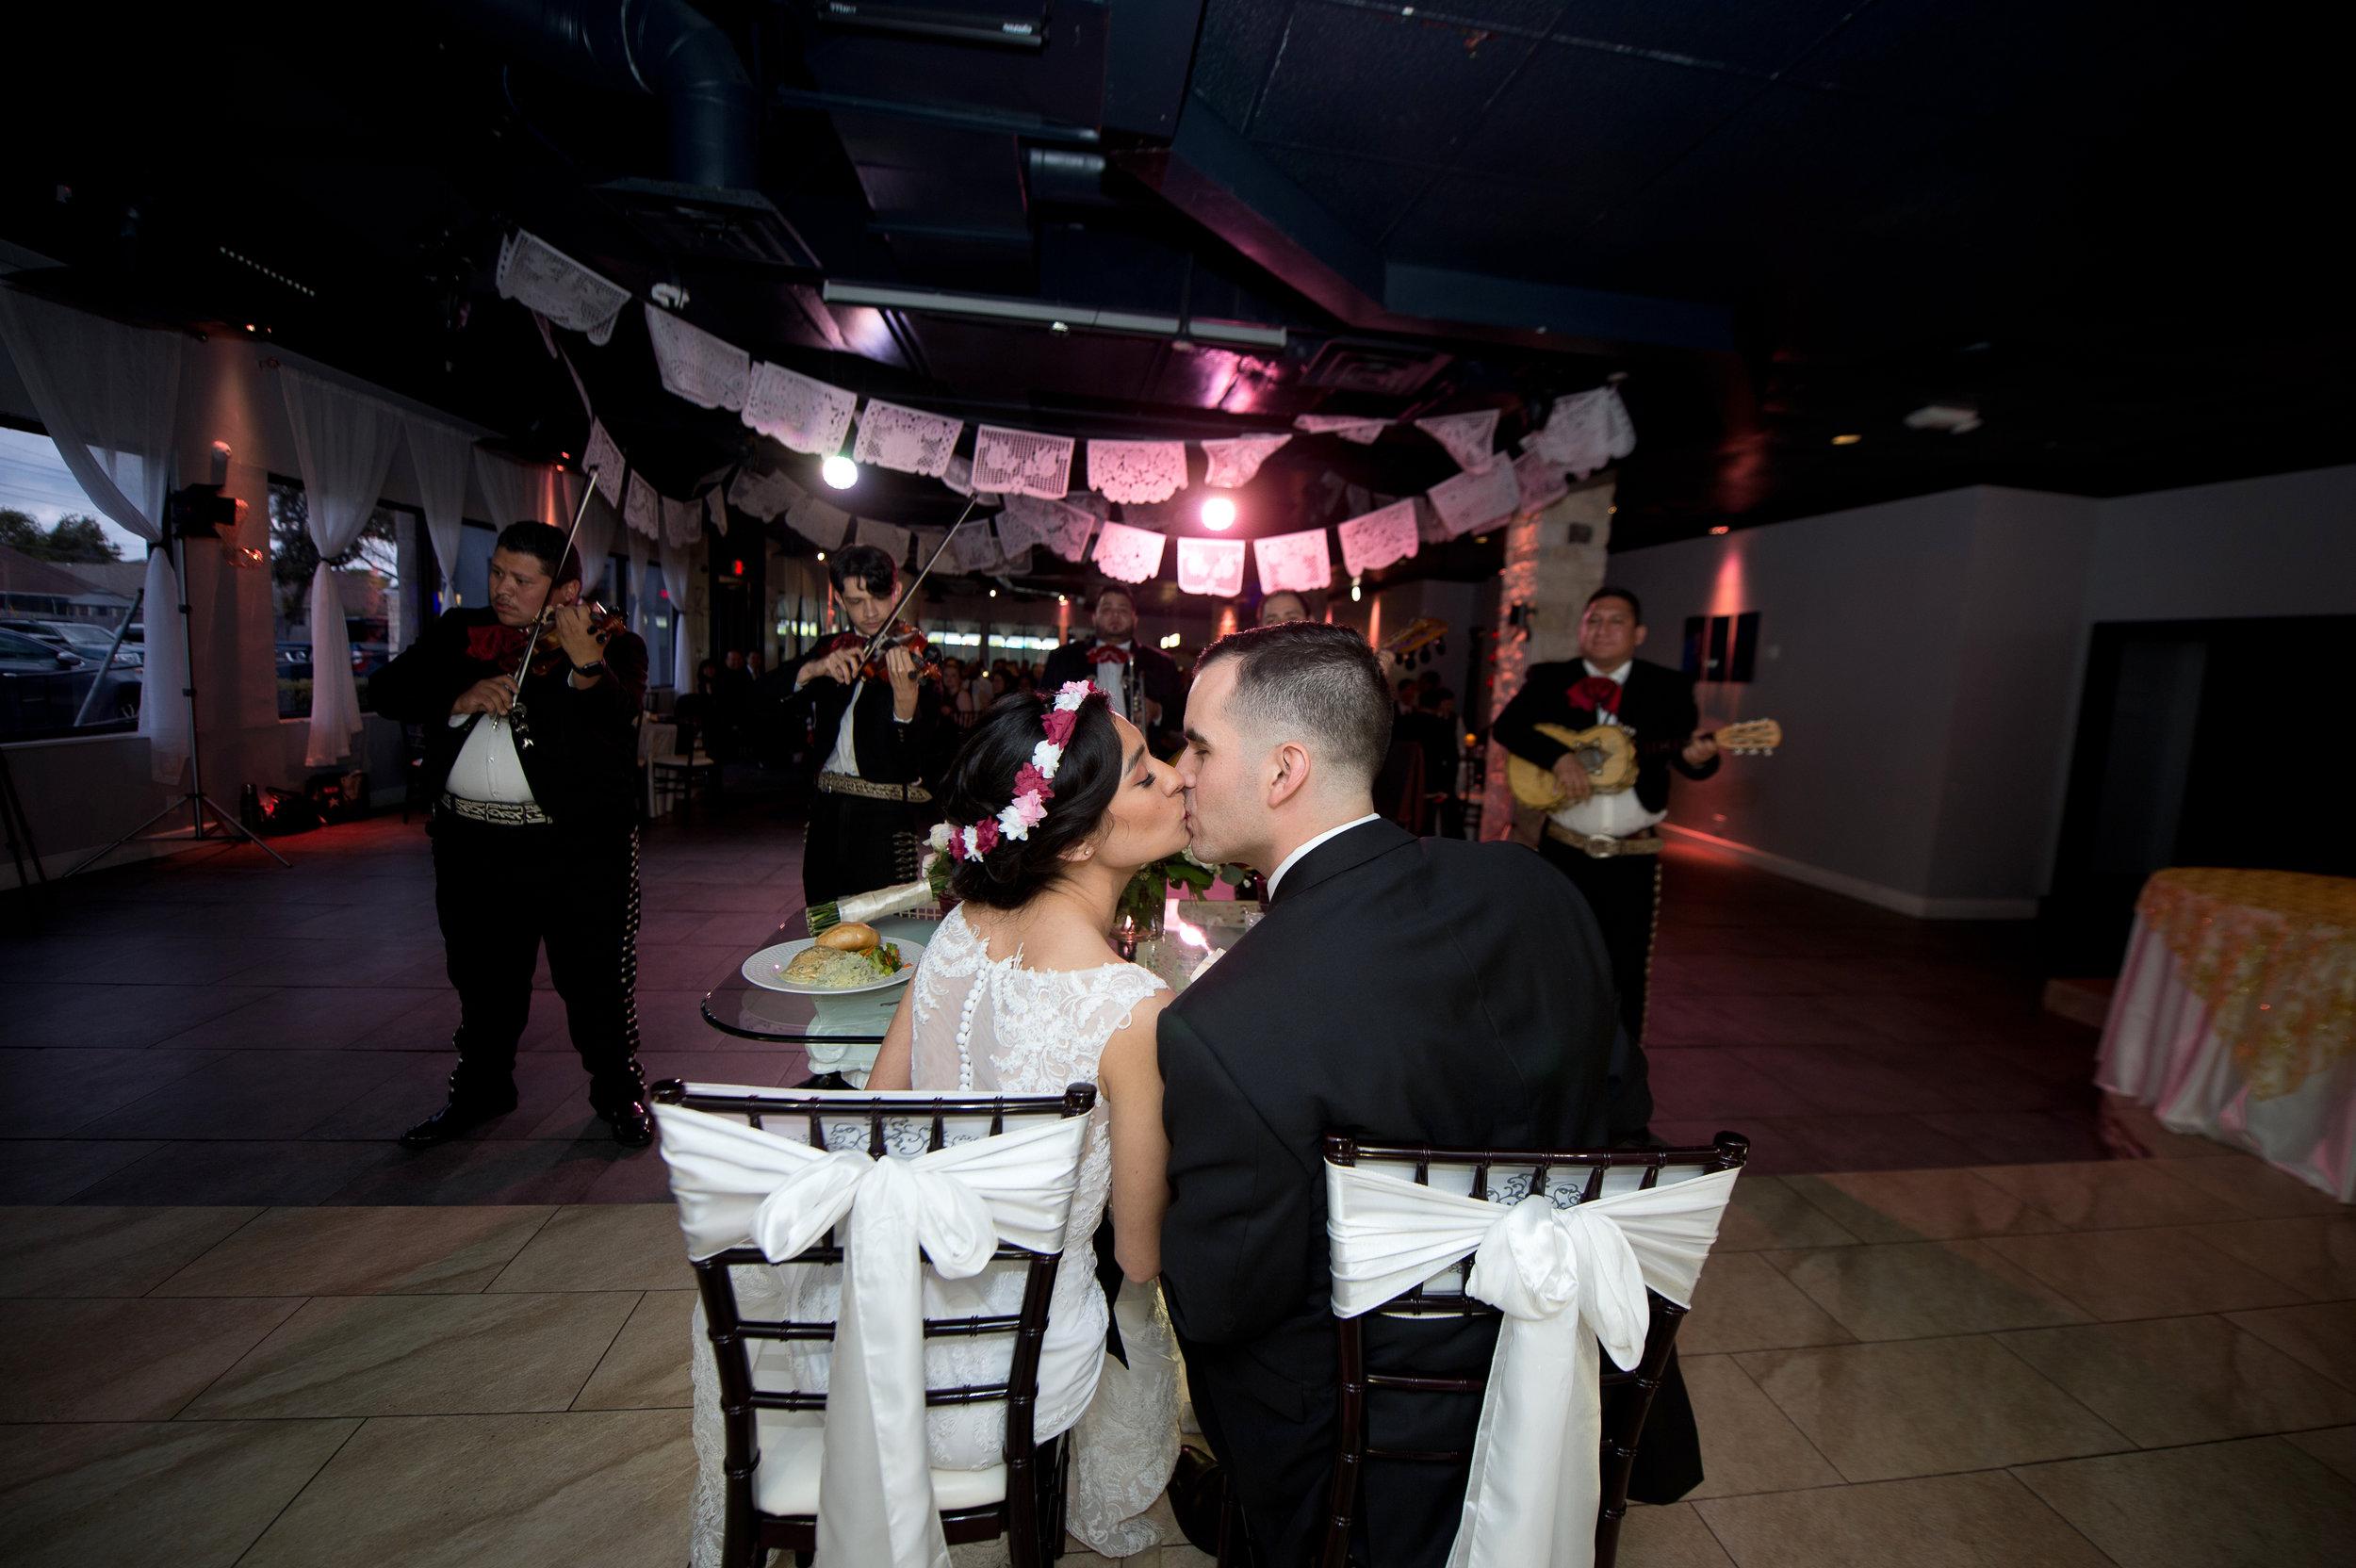 A happy couple celebrates their wedding day at Moonlight Ballroom. (Photo by  Dionicio Perez  - Photographer)